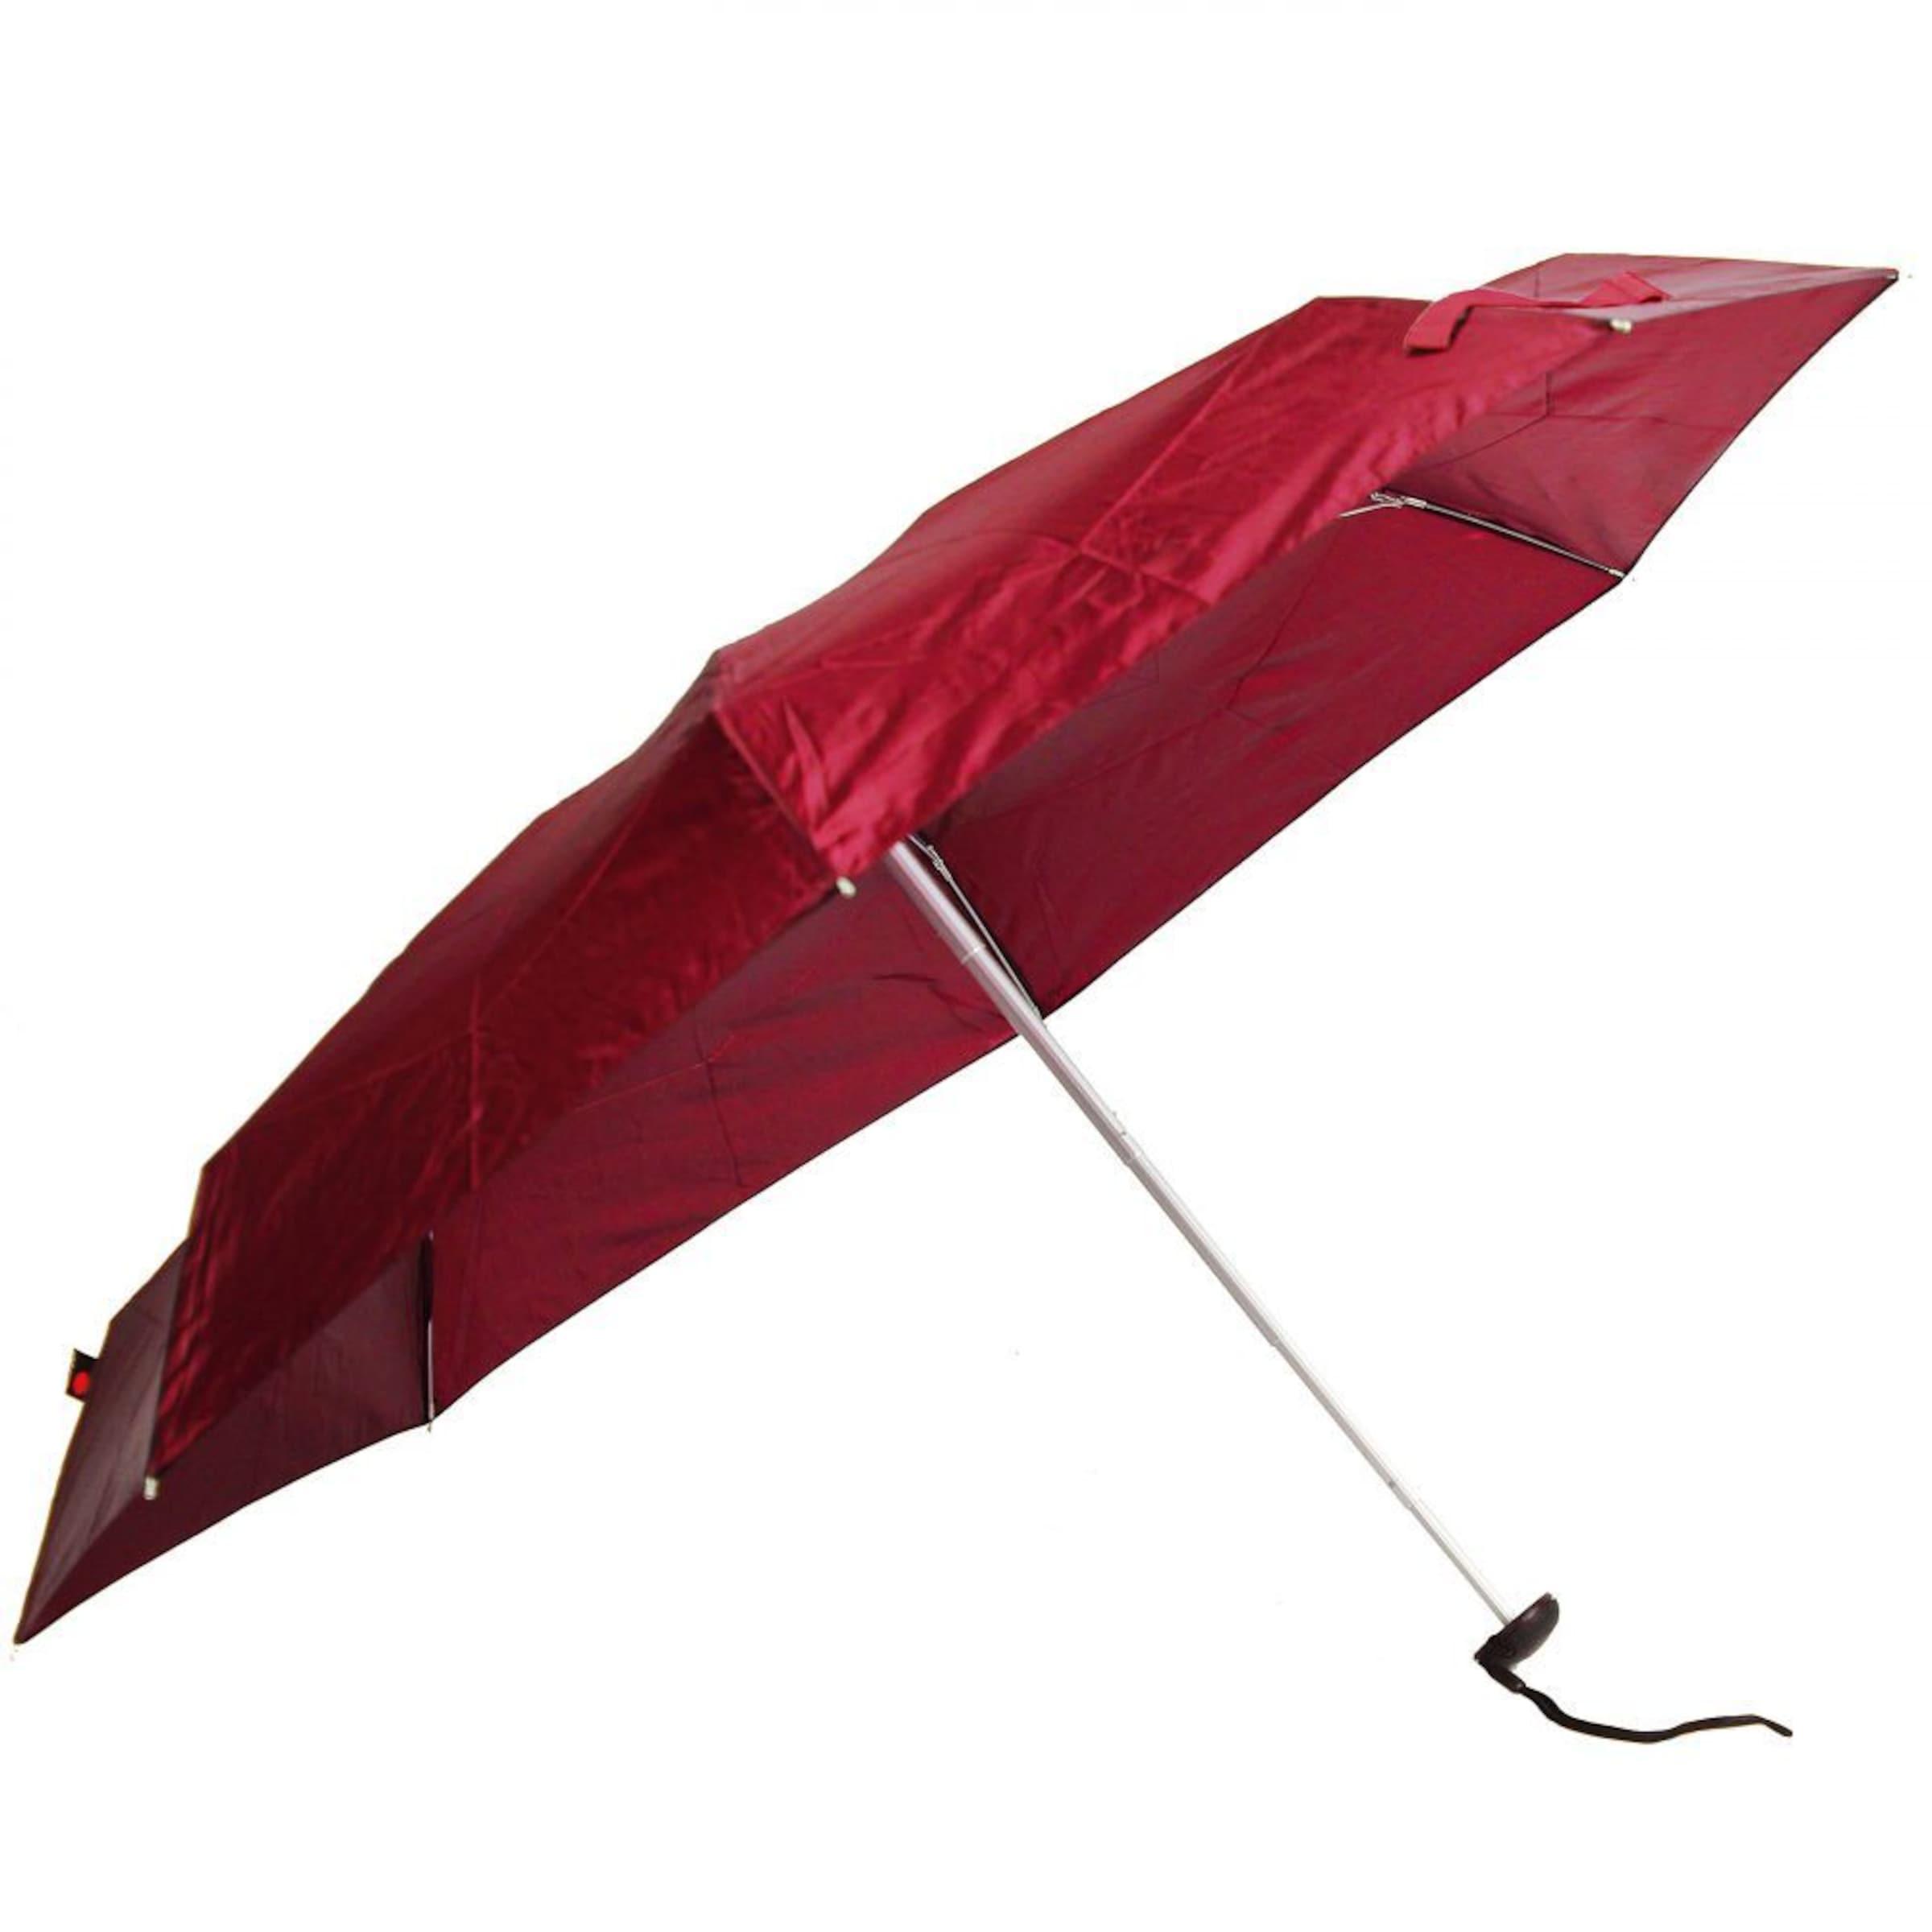 Rouge Parapluie X1' 'manual Knirps En DHI92WEY